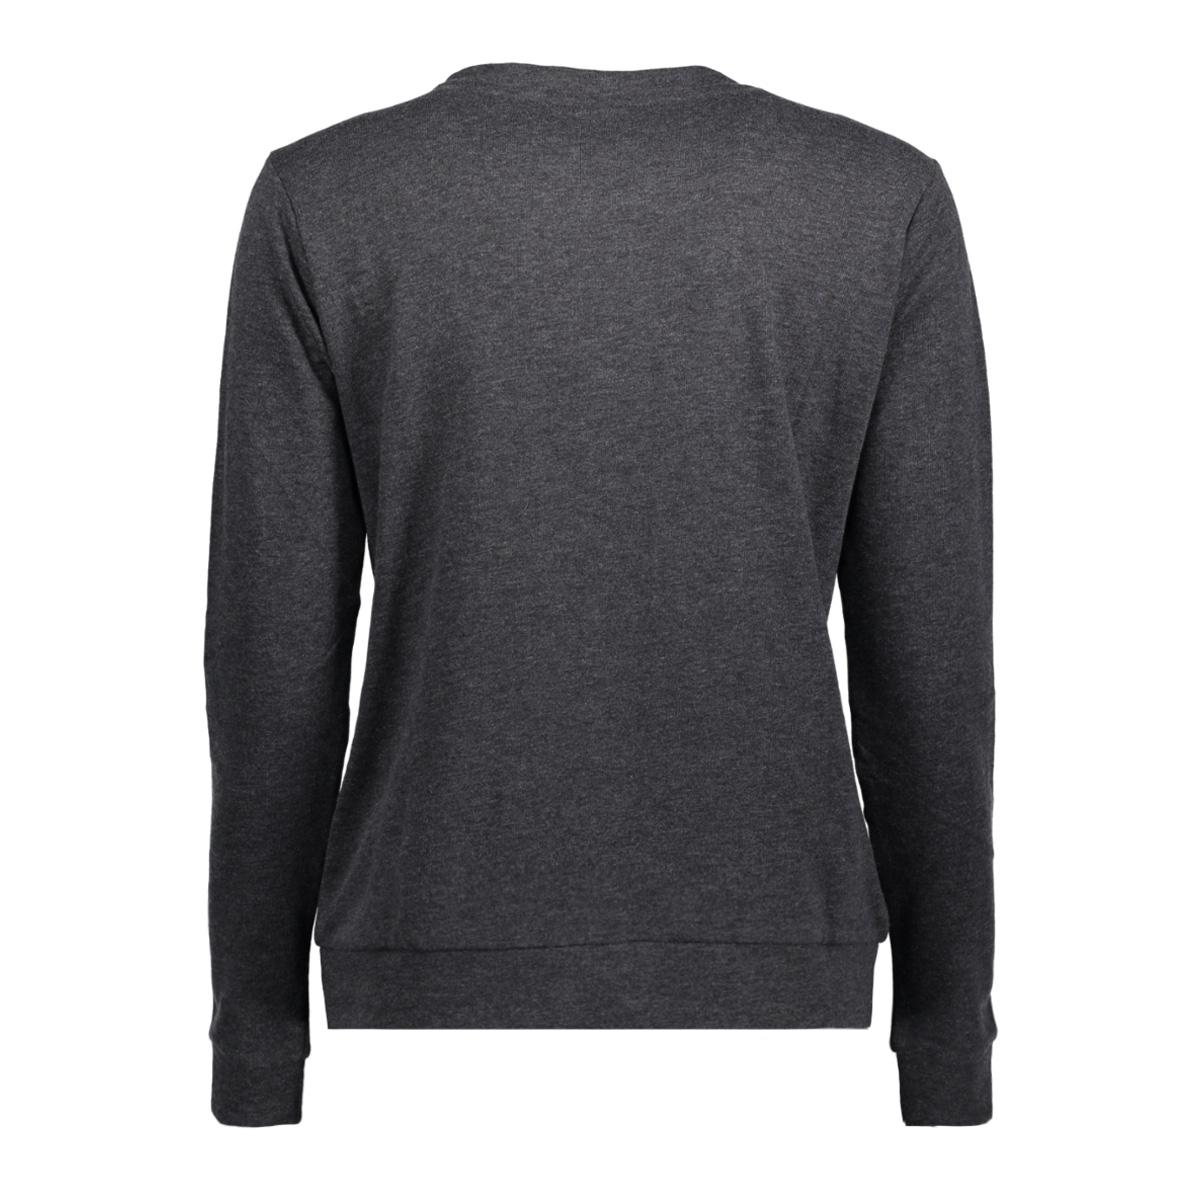 jdymilly l/s print sweat swt rpt 15133660 jacqueline de yong sweater dark grey melange/ stylerunner